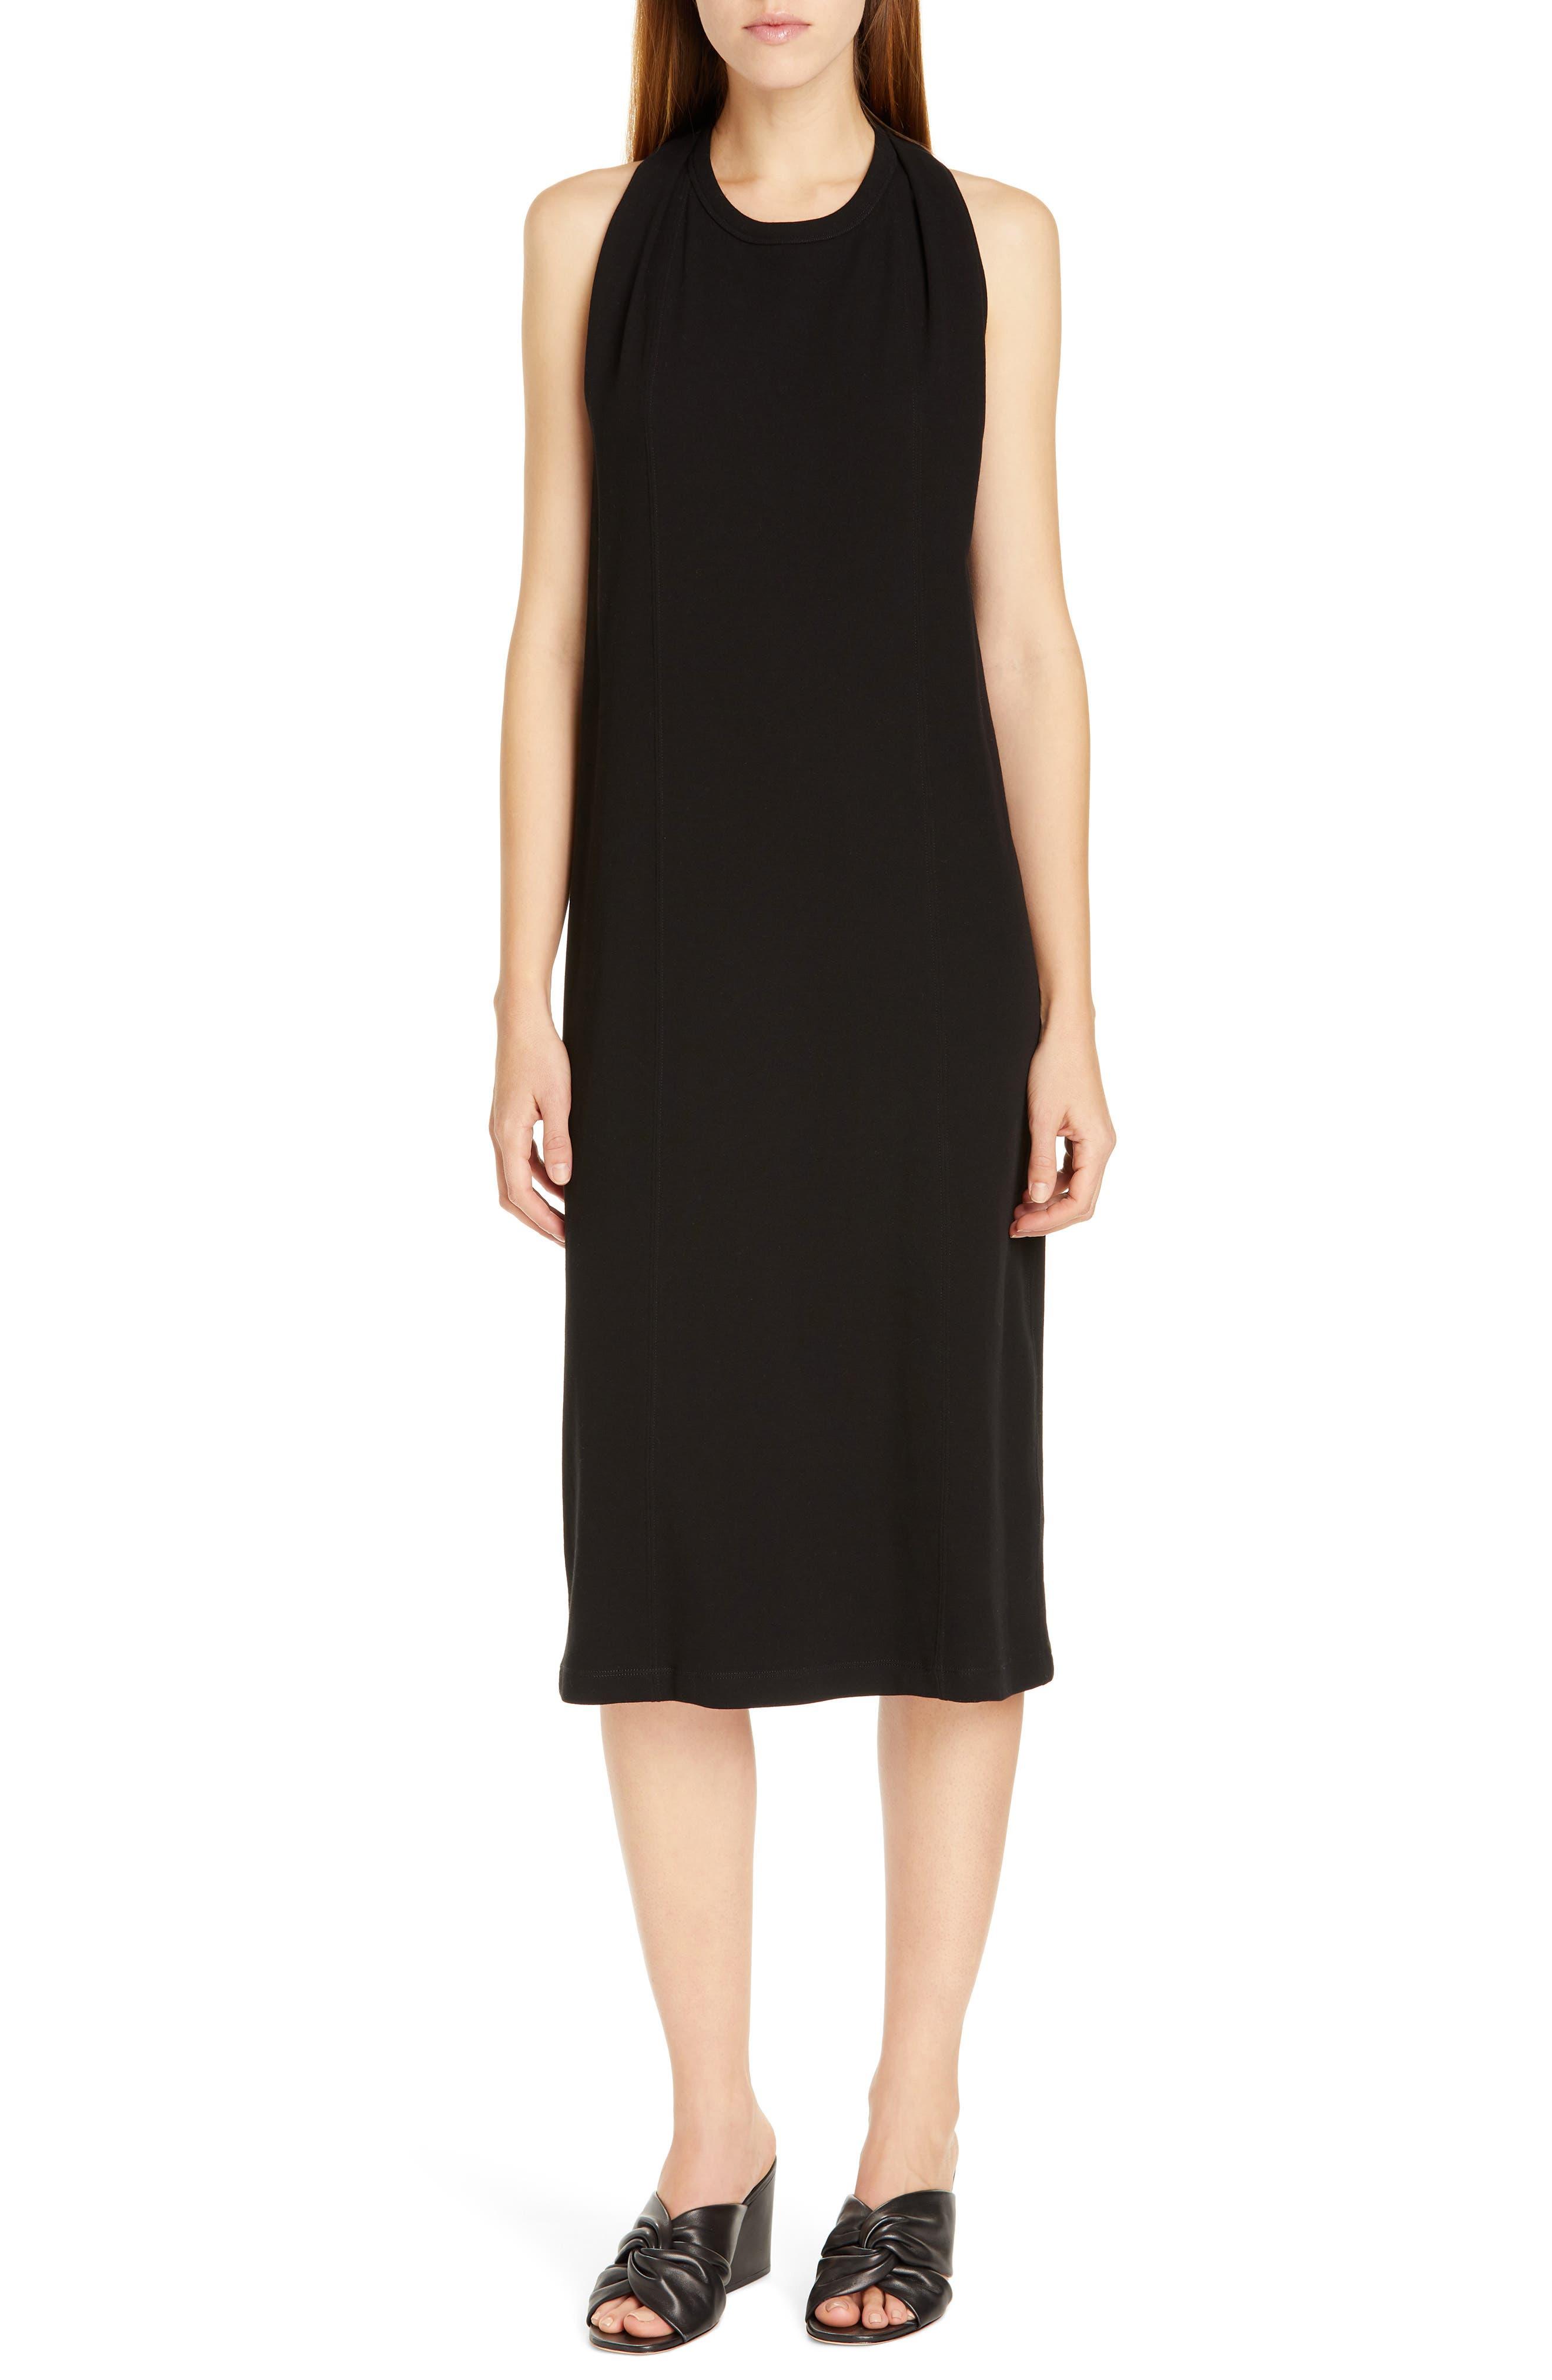 Helmut Lang Halter Neck Cotton Jersey Dress, Black